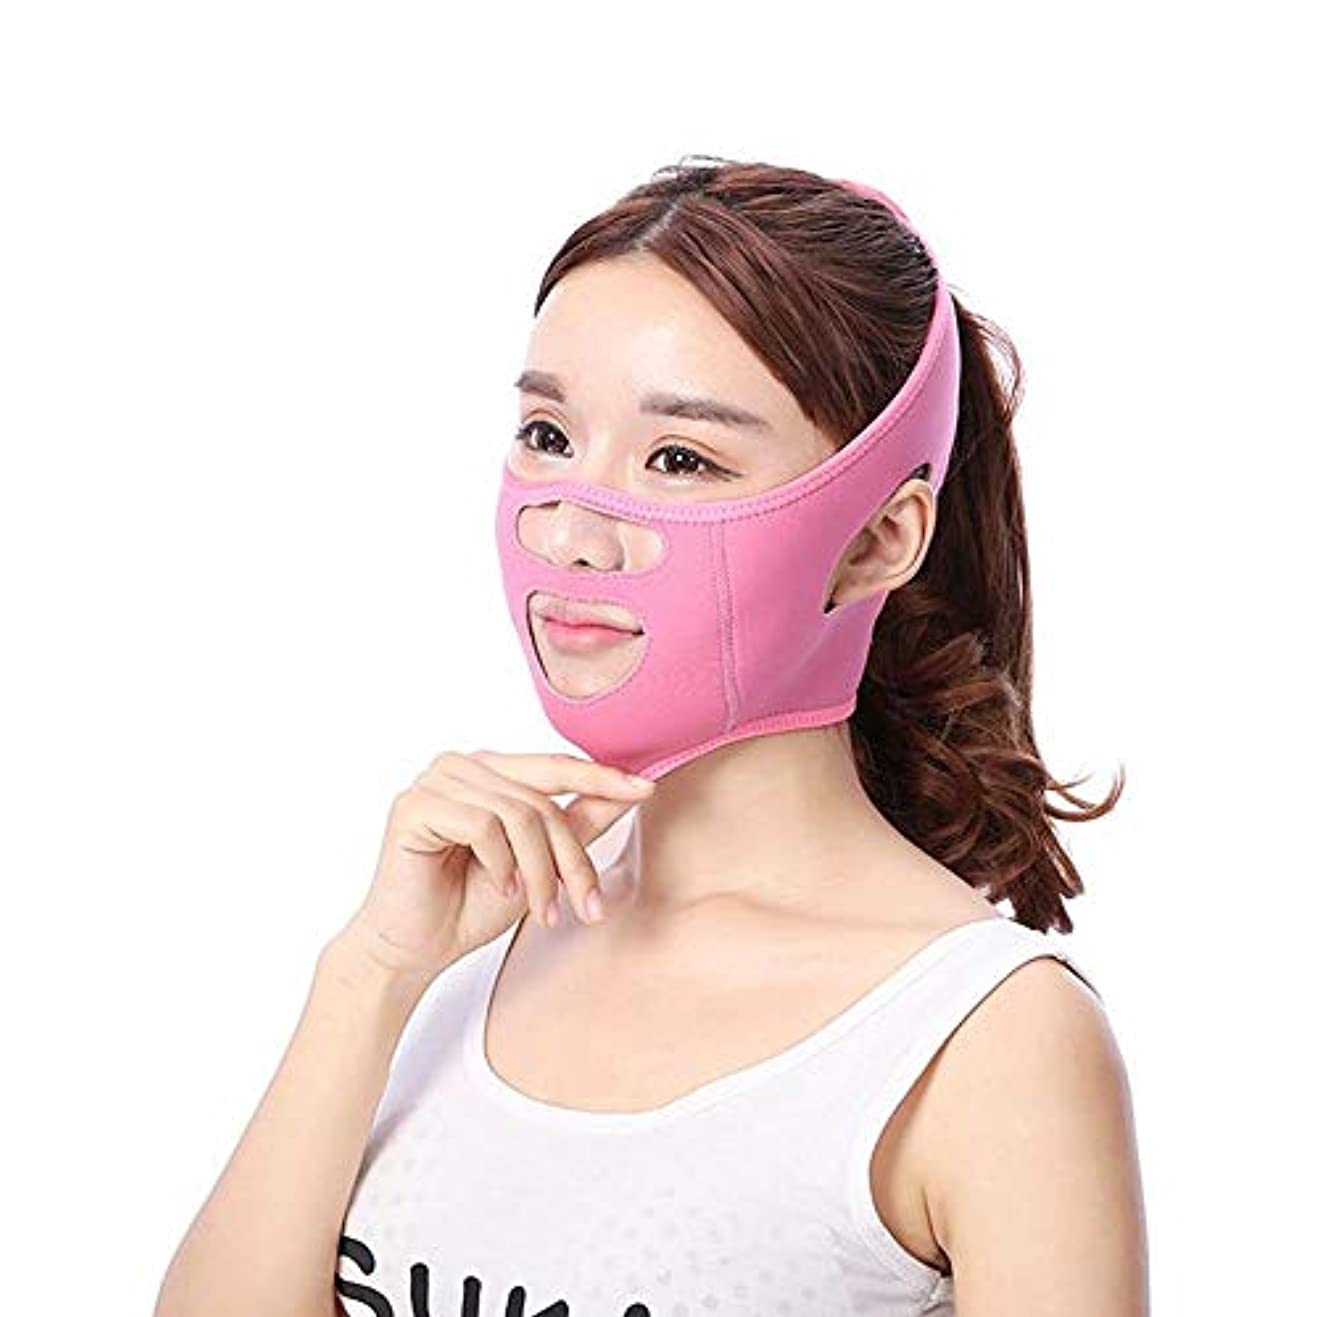 GYZ シンフェイスアーティファクトリフティング引き締めフェイス睡眠包帯フェイシャルリフティングアンチ垂れ下がり法律パターンステッカー8ワード口角 - ピンク Thin Face Belt